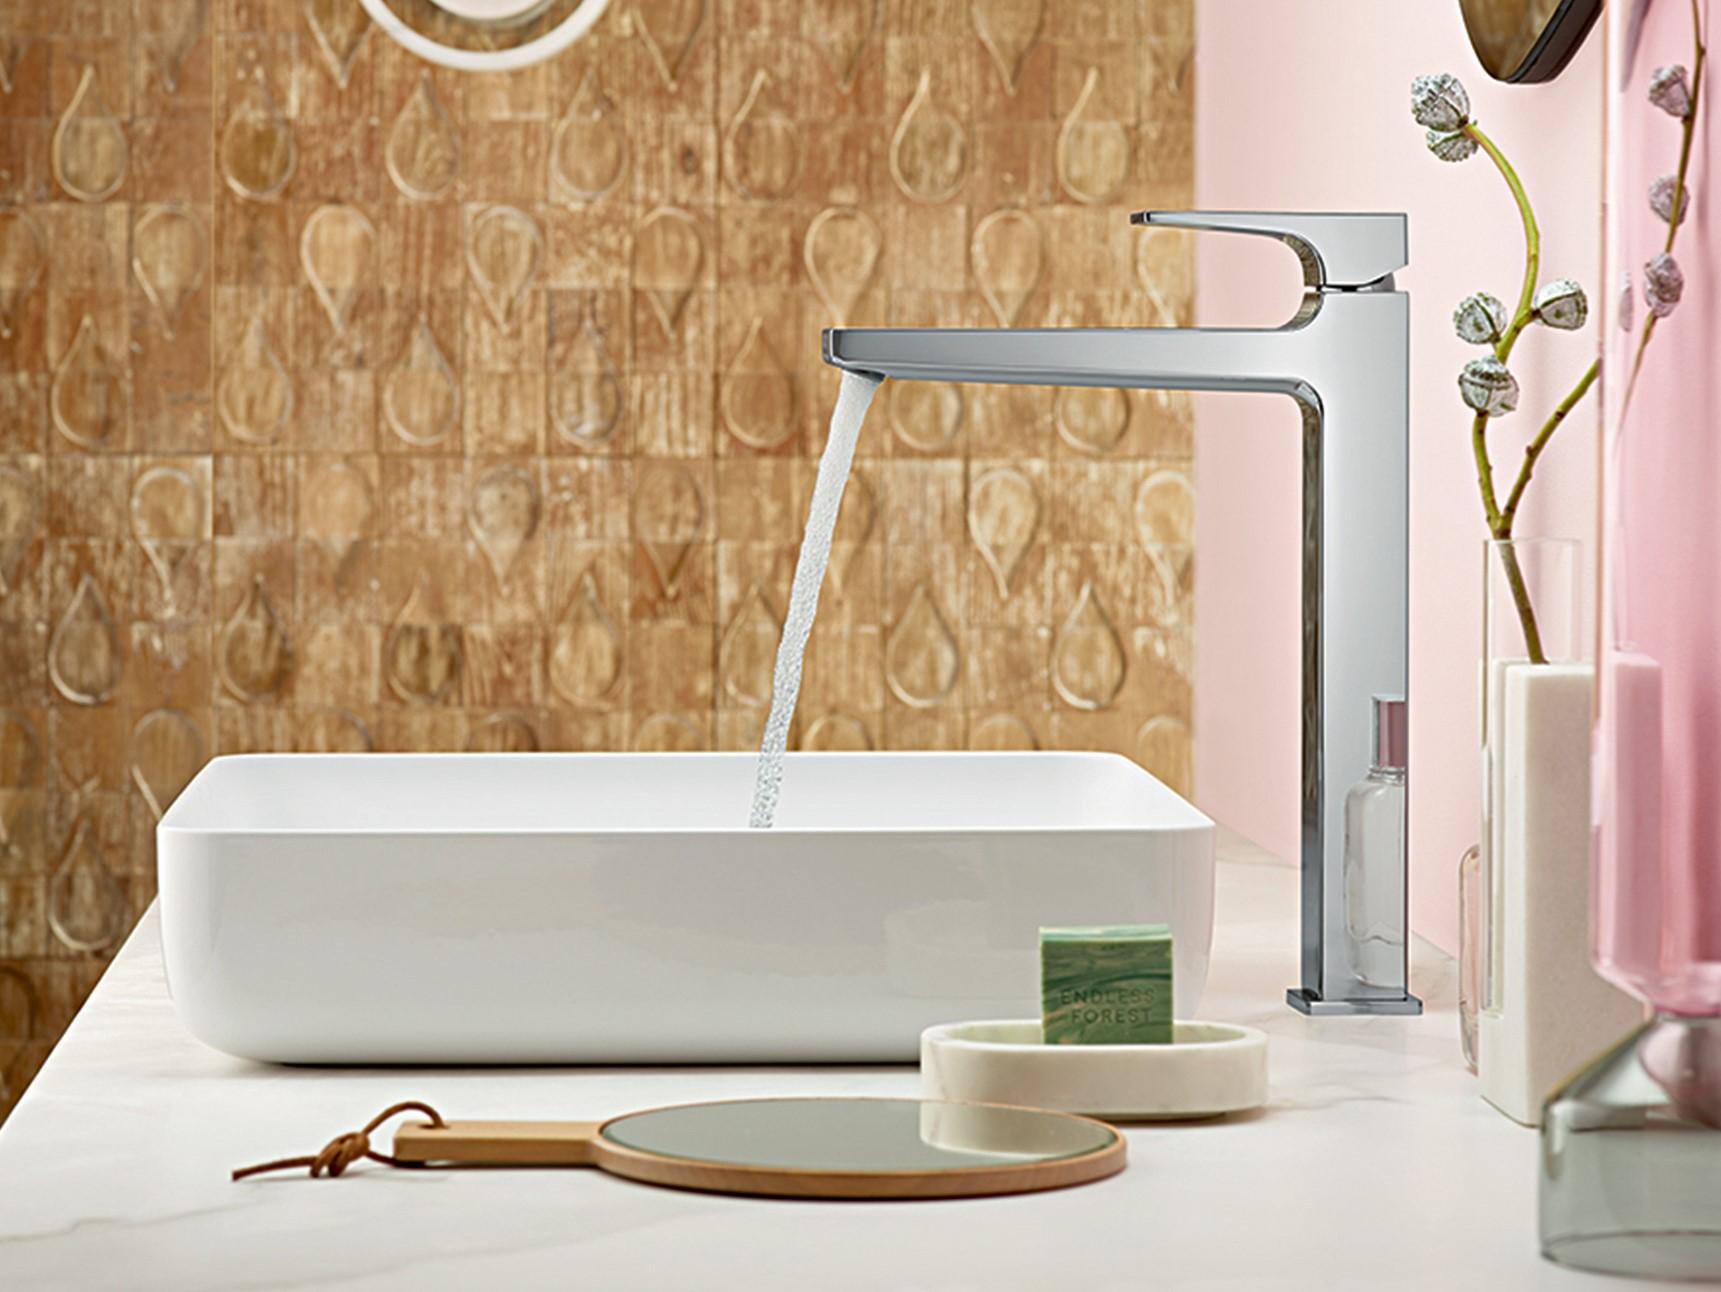 wash basins showers and bath tubs